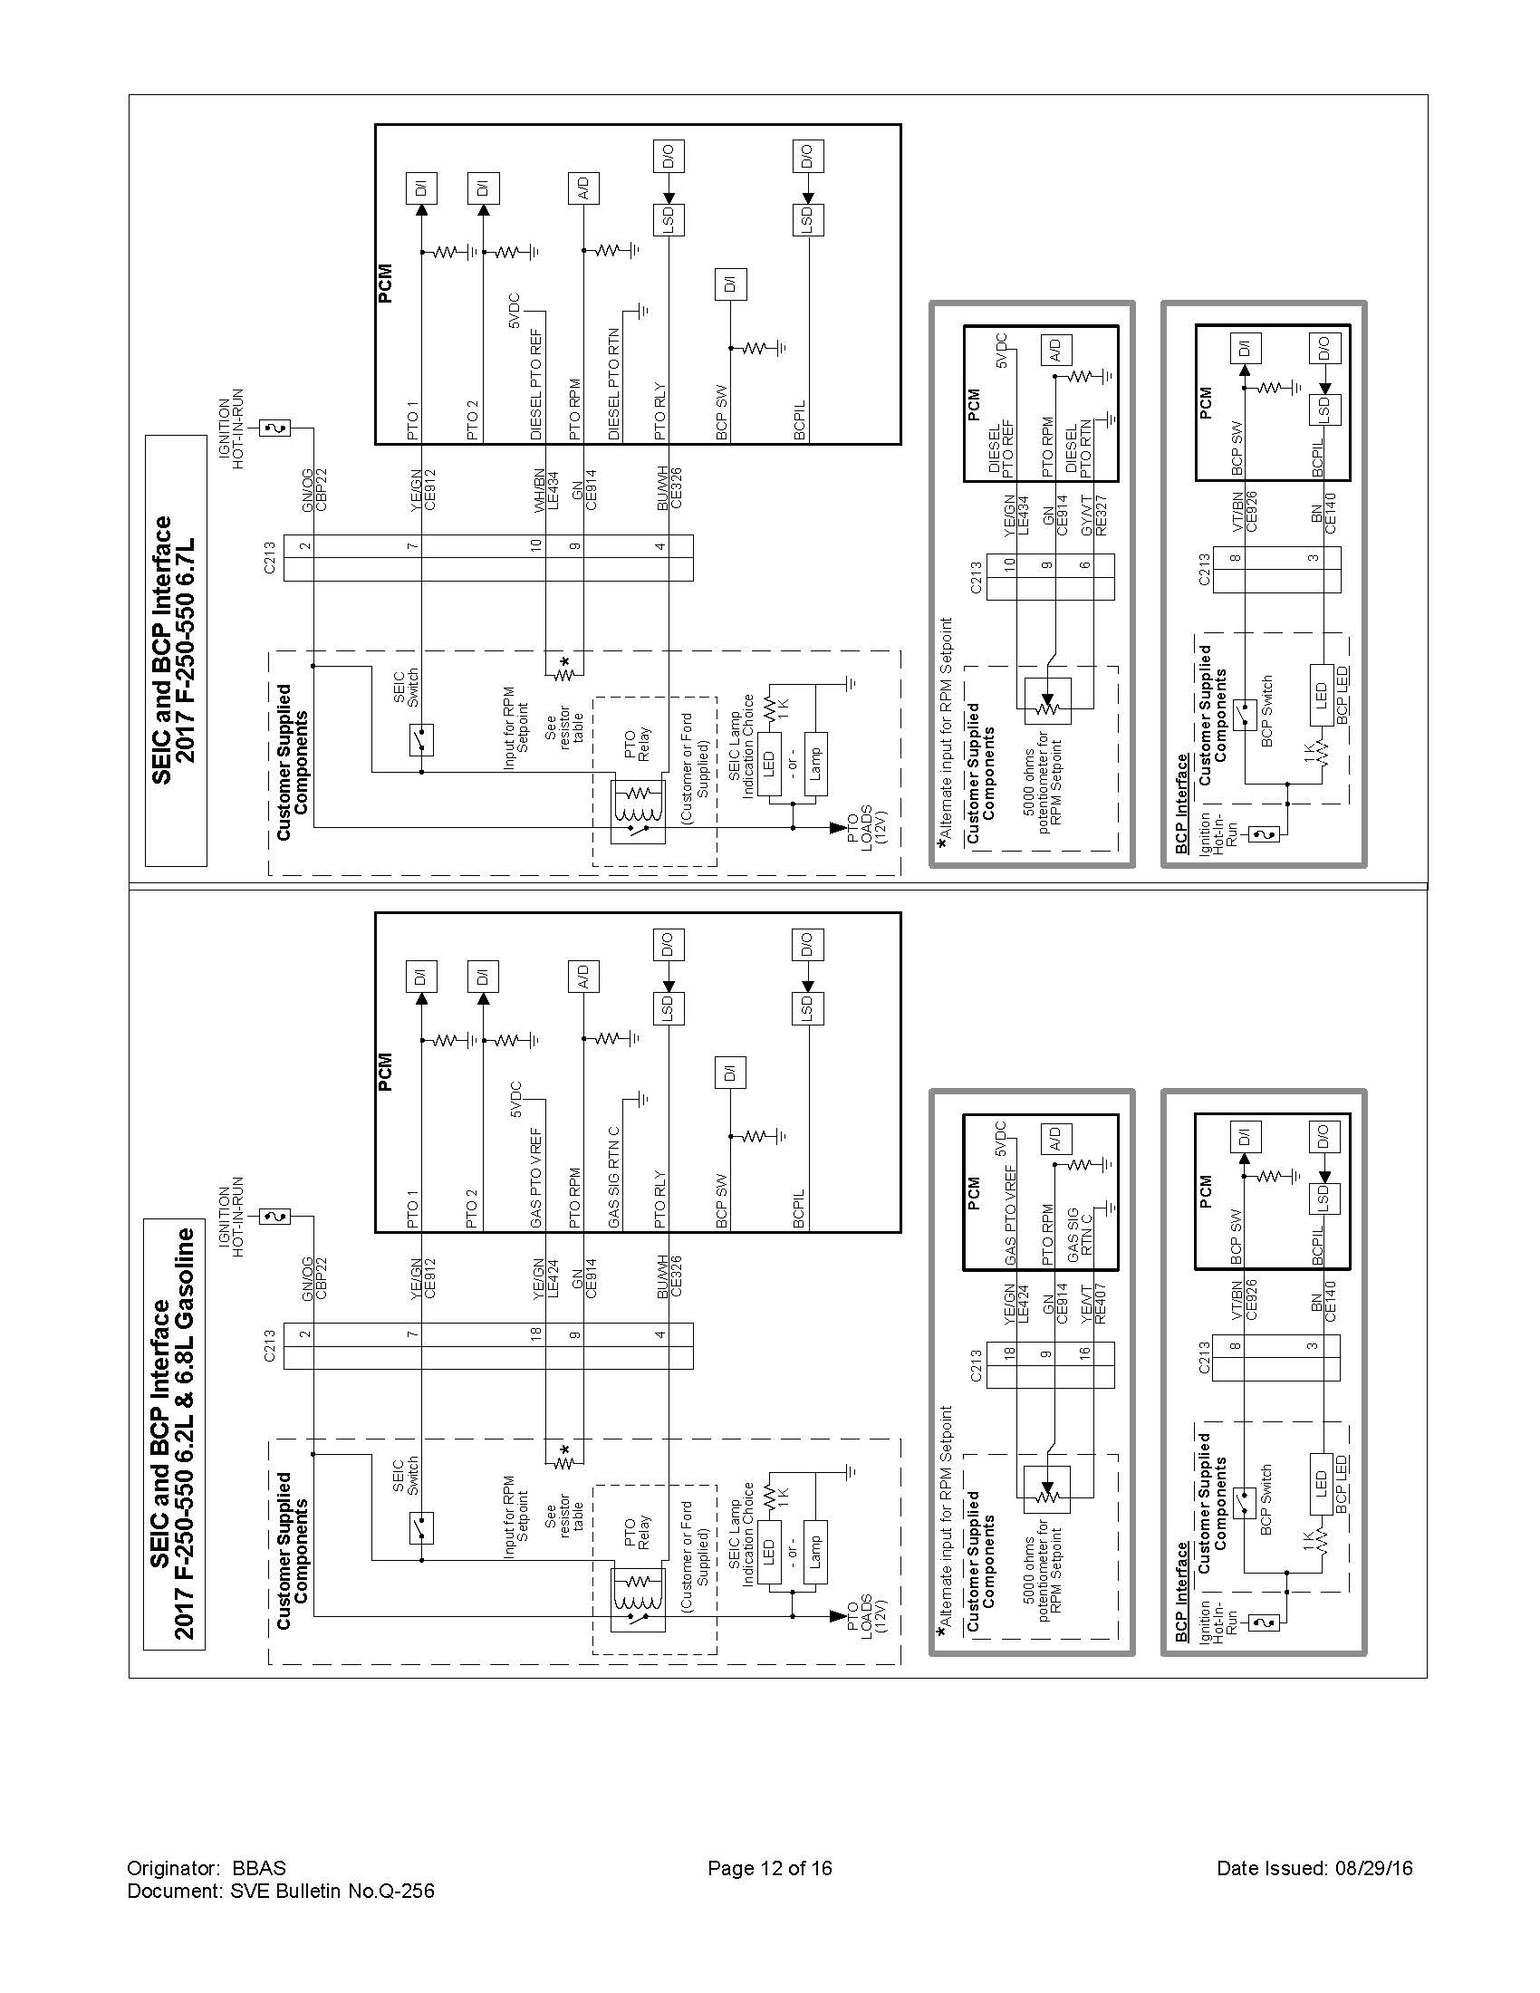 Wiring Diagram For Pto   Wiring Diagram on pto brochure, pto switch, pto chart, pto board, pto wire harness,